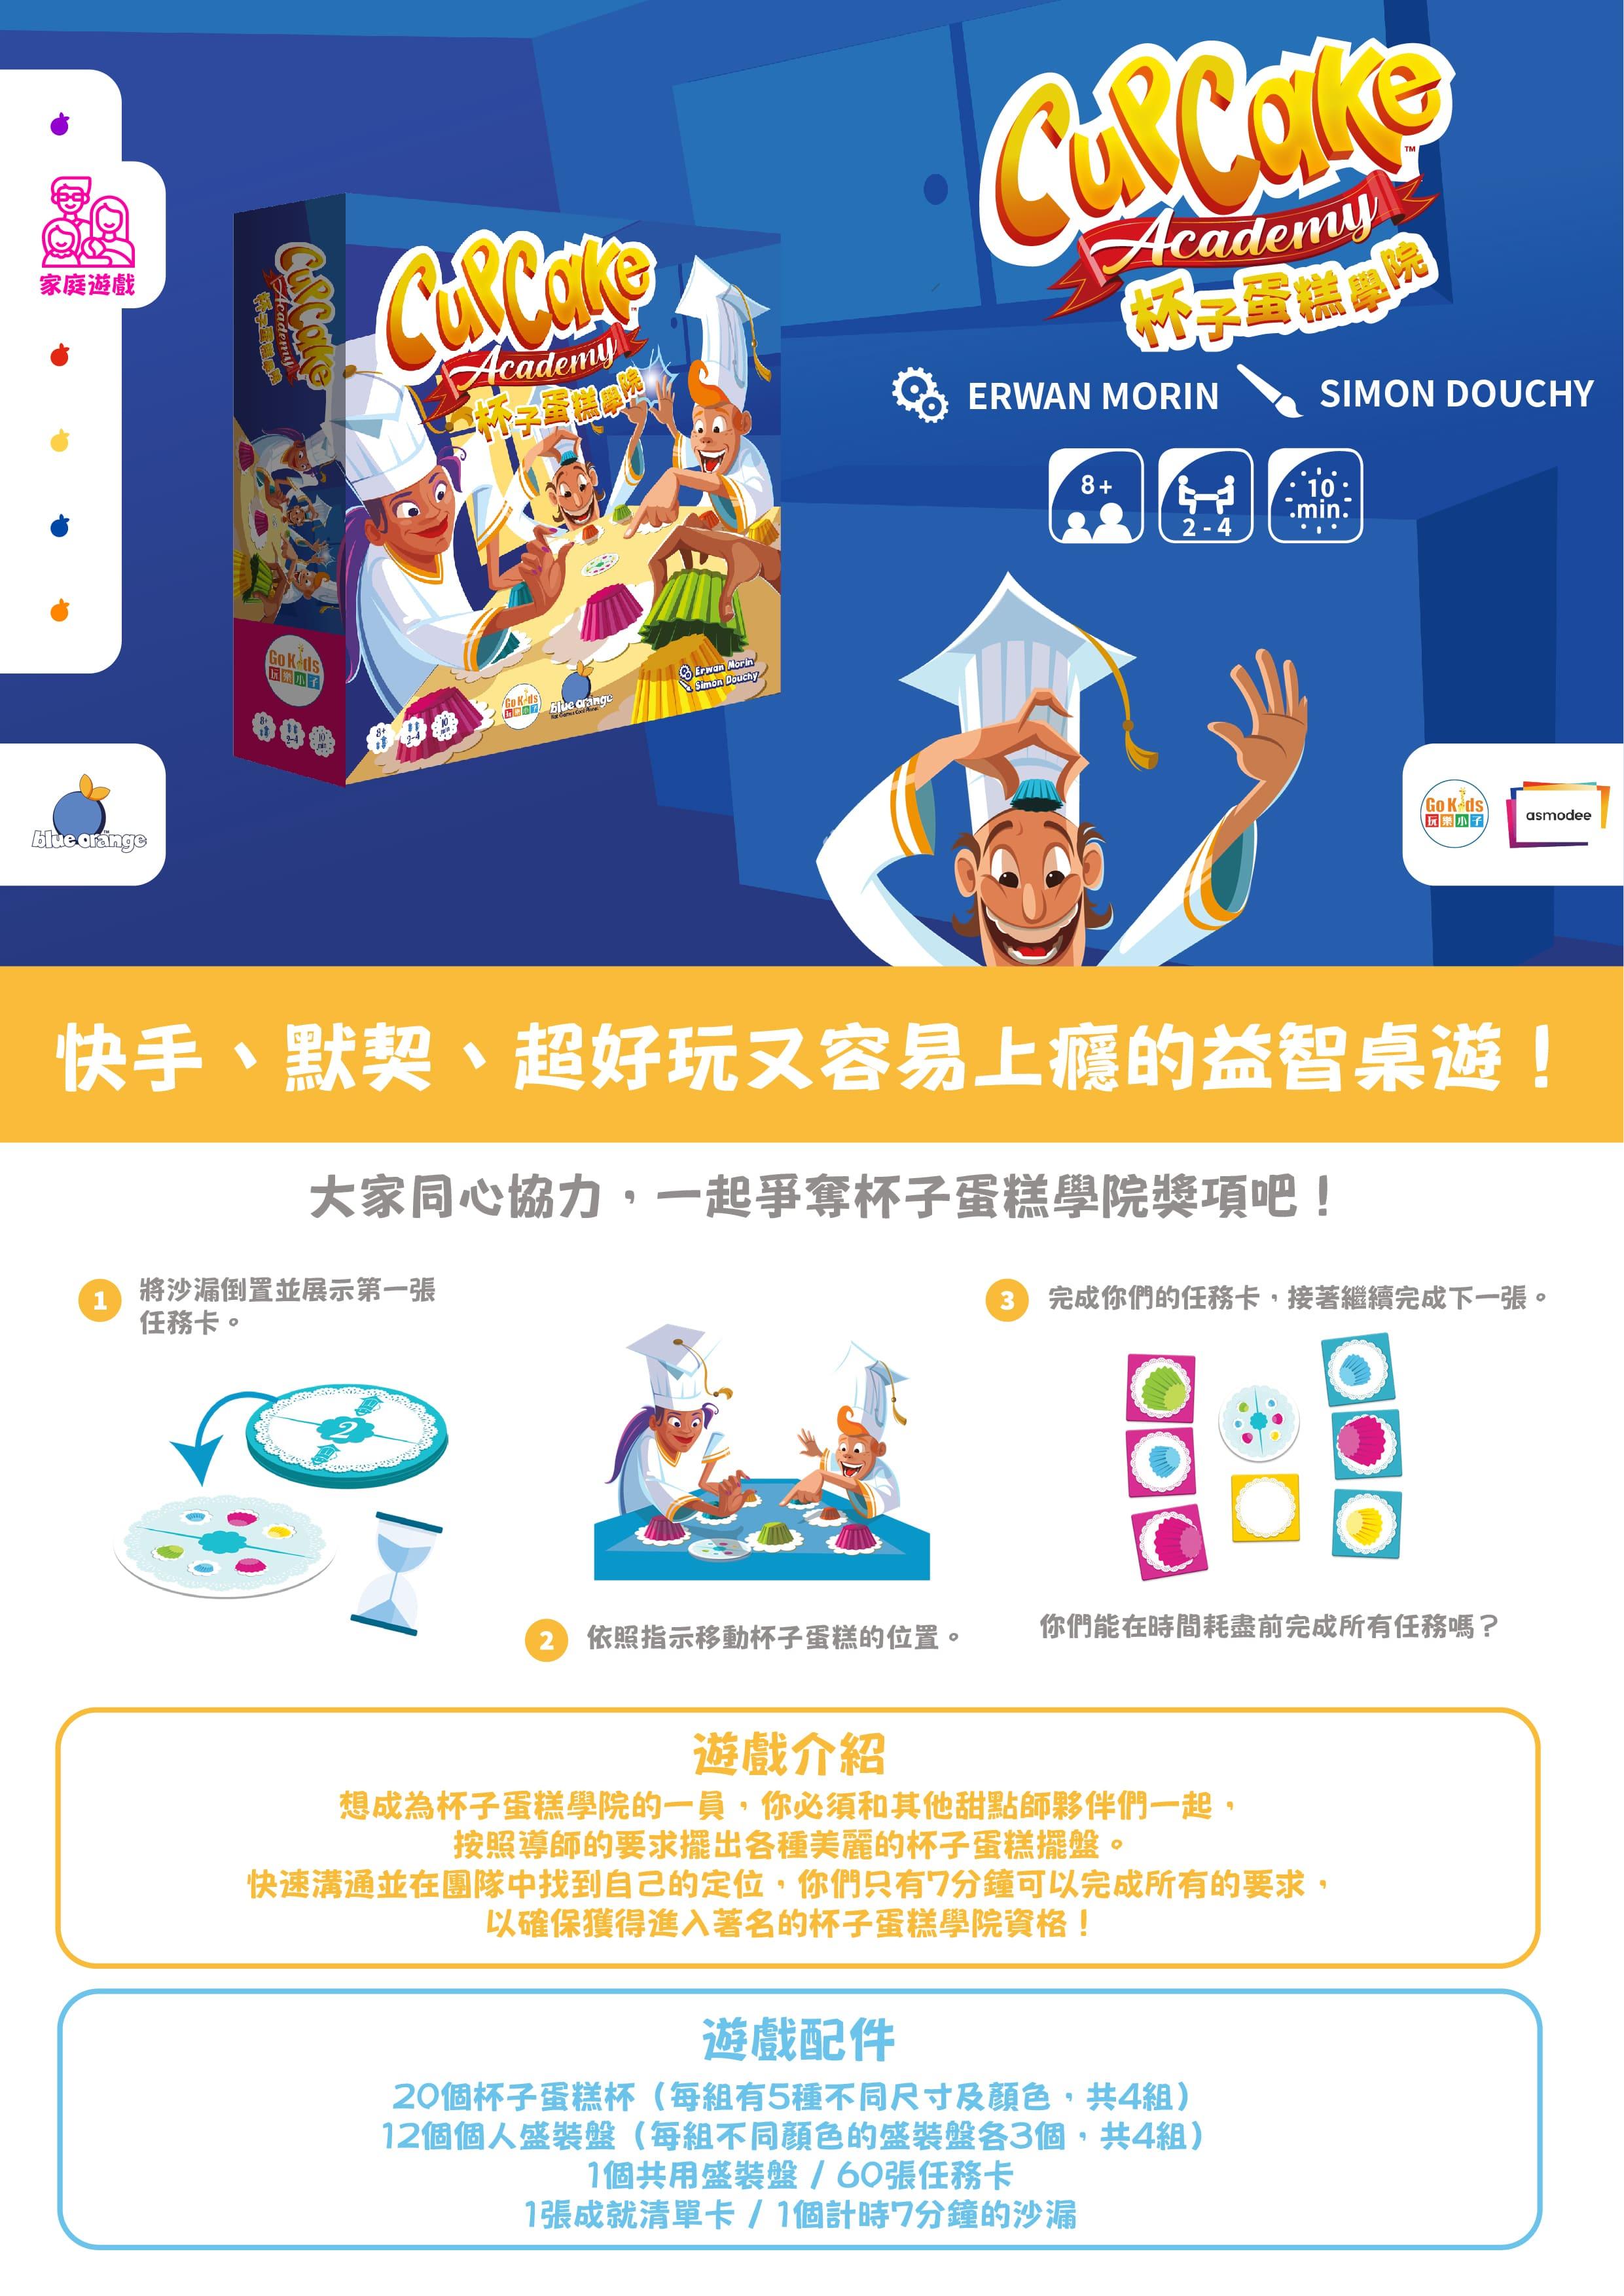 《GoKids 玩樂小子》桌遊 杯子蛋糕學院 (中文版)Cupcake Academy 東喬精品百貨